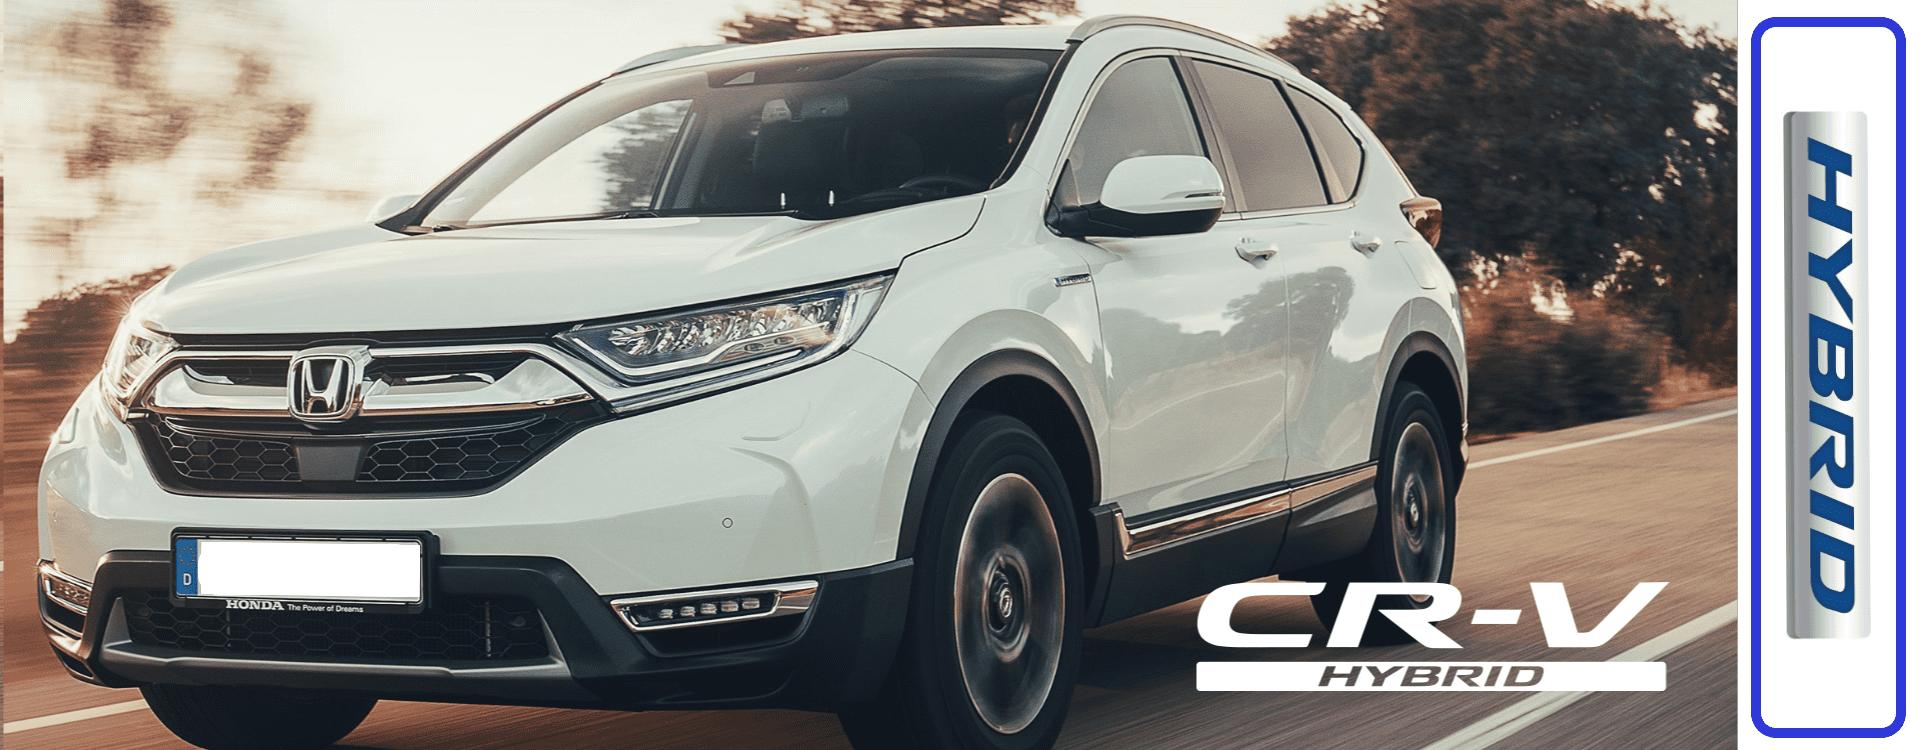 De nieuwe CR-V Hybrid